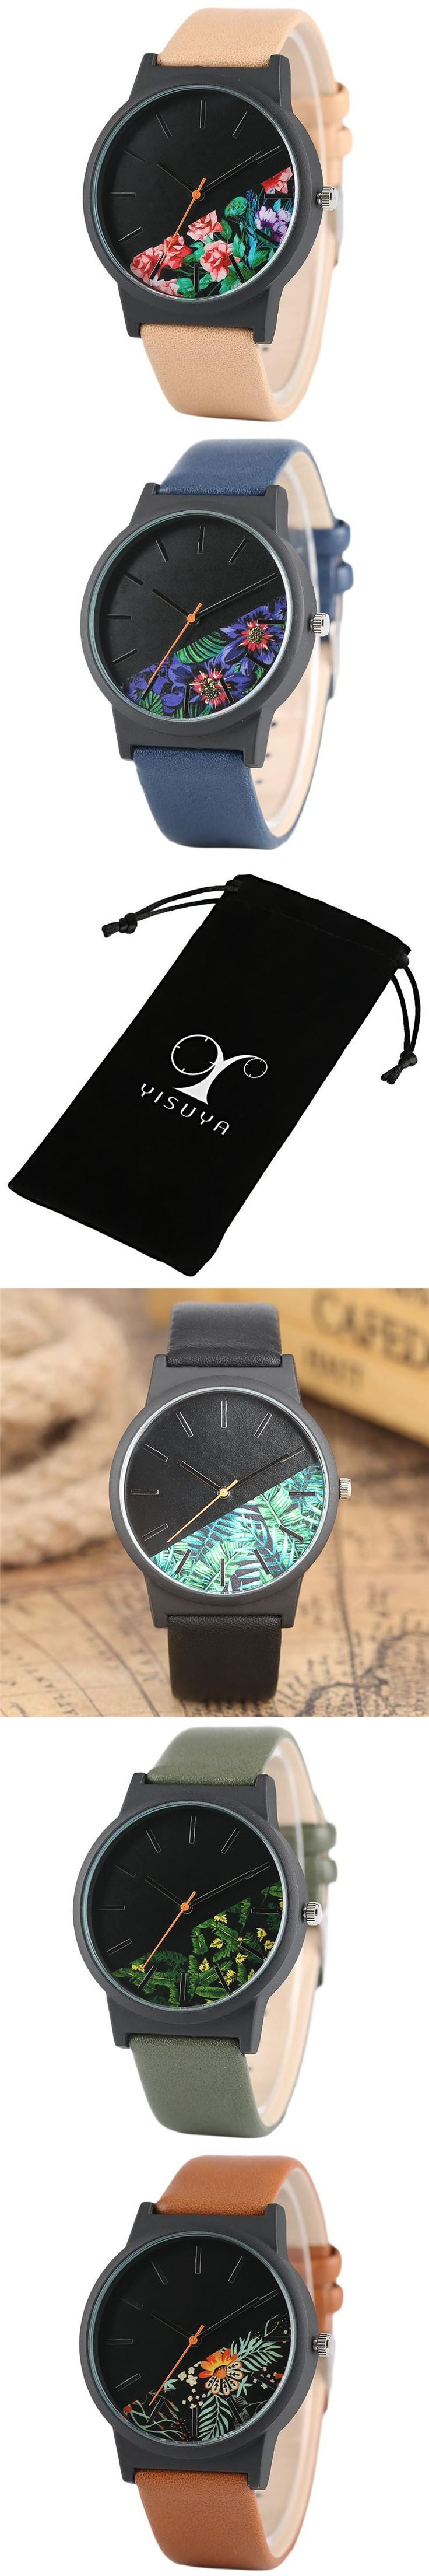 Tropical Jungle Design Pilot Quartz Men Watch Fashion Outdoor Aviator Women Watches Sport Leather Band Unique Clock 2017 New